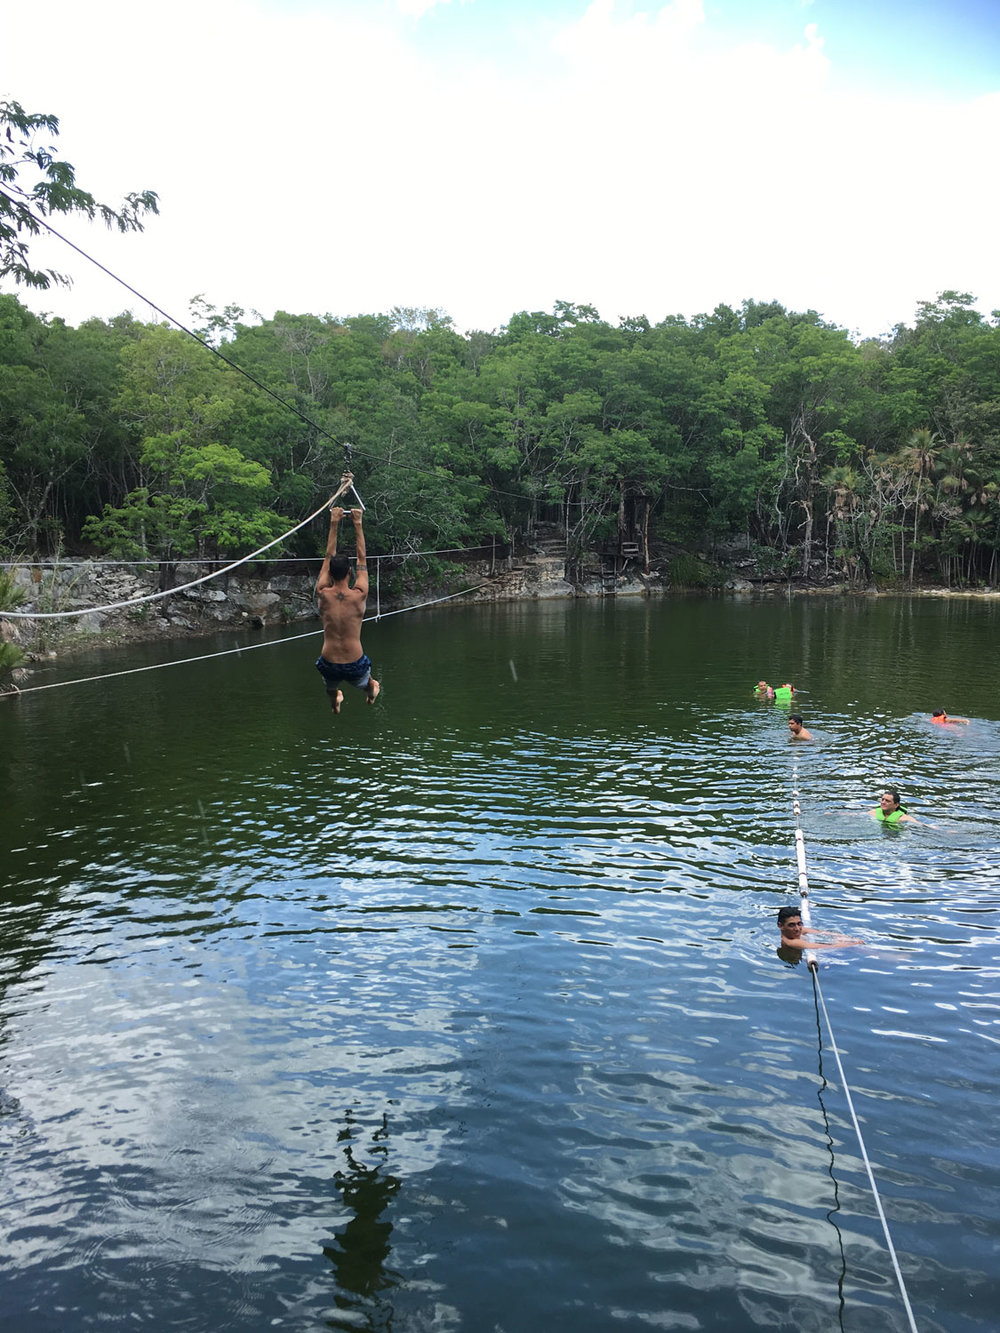 Hammocks_and_Ruins_Blog_Riviera_Maya_Mexico_Travel_Discover_Cenotes_Playa_del_Carmen_Tulum_Coba_Cenote_Trail_Las_Mojarras_13.jpg